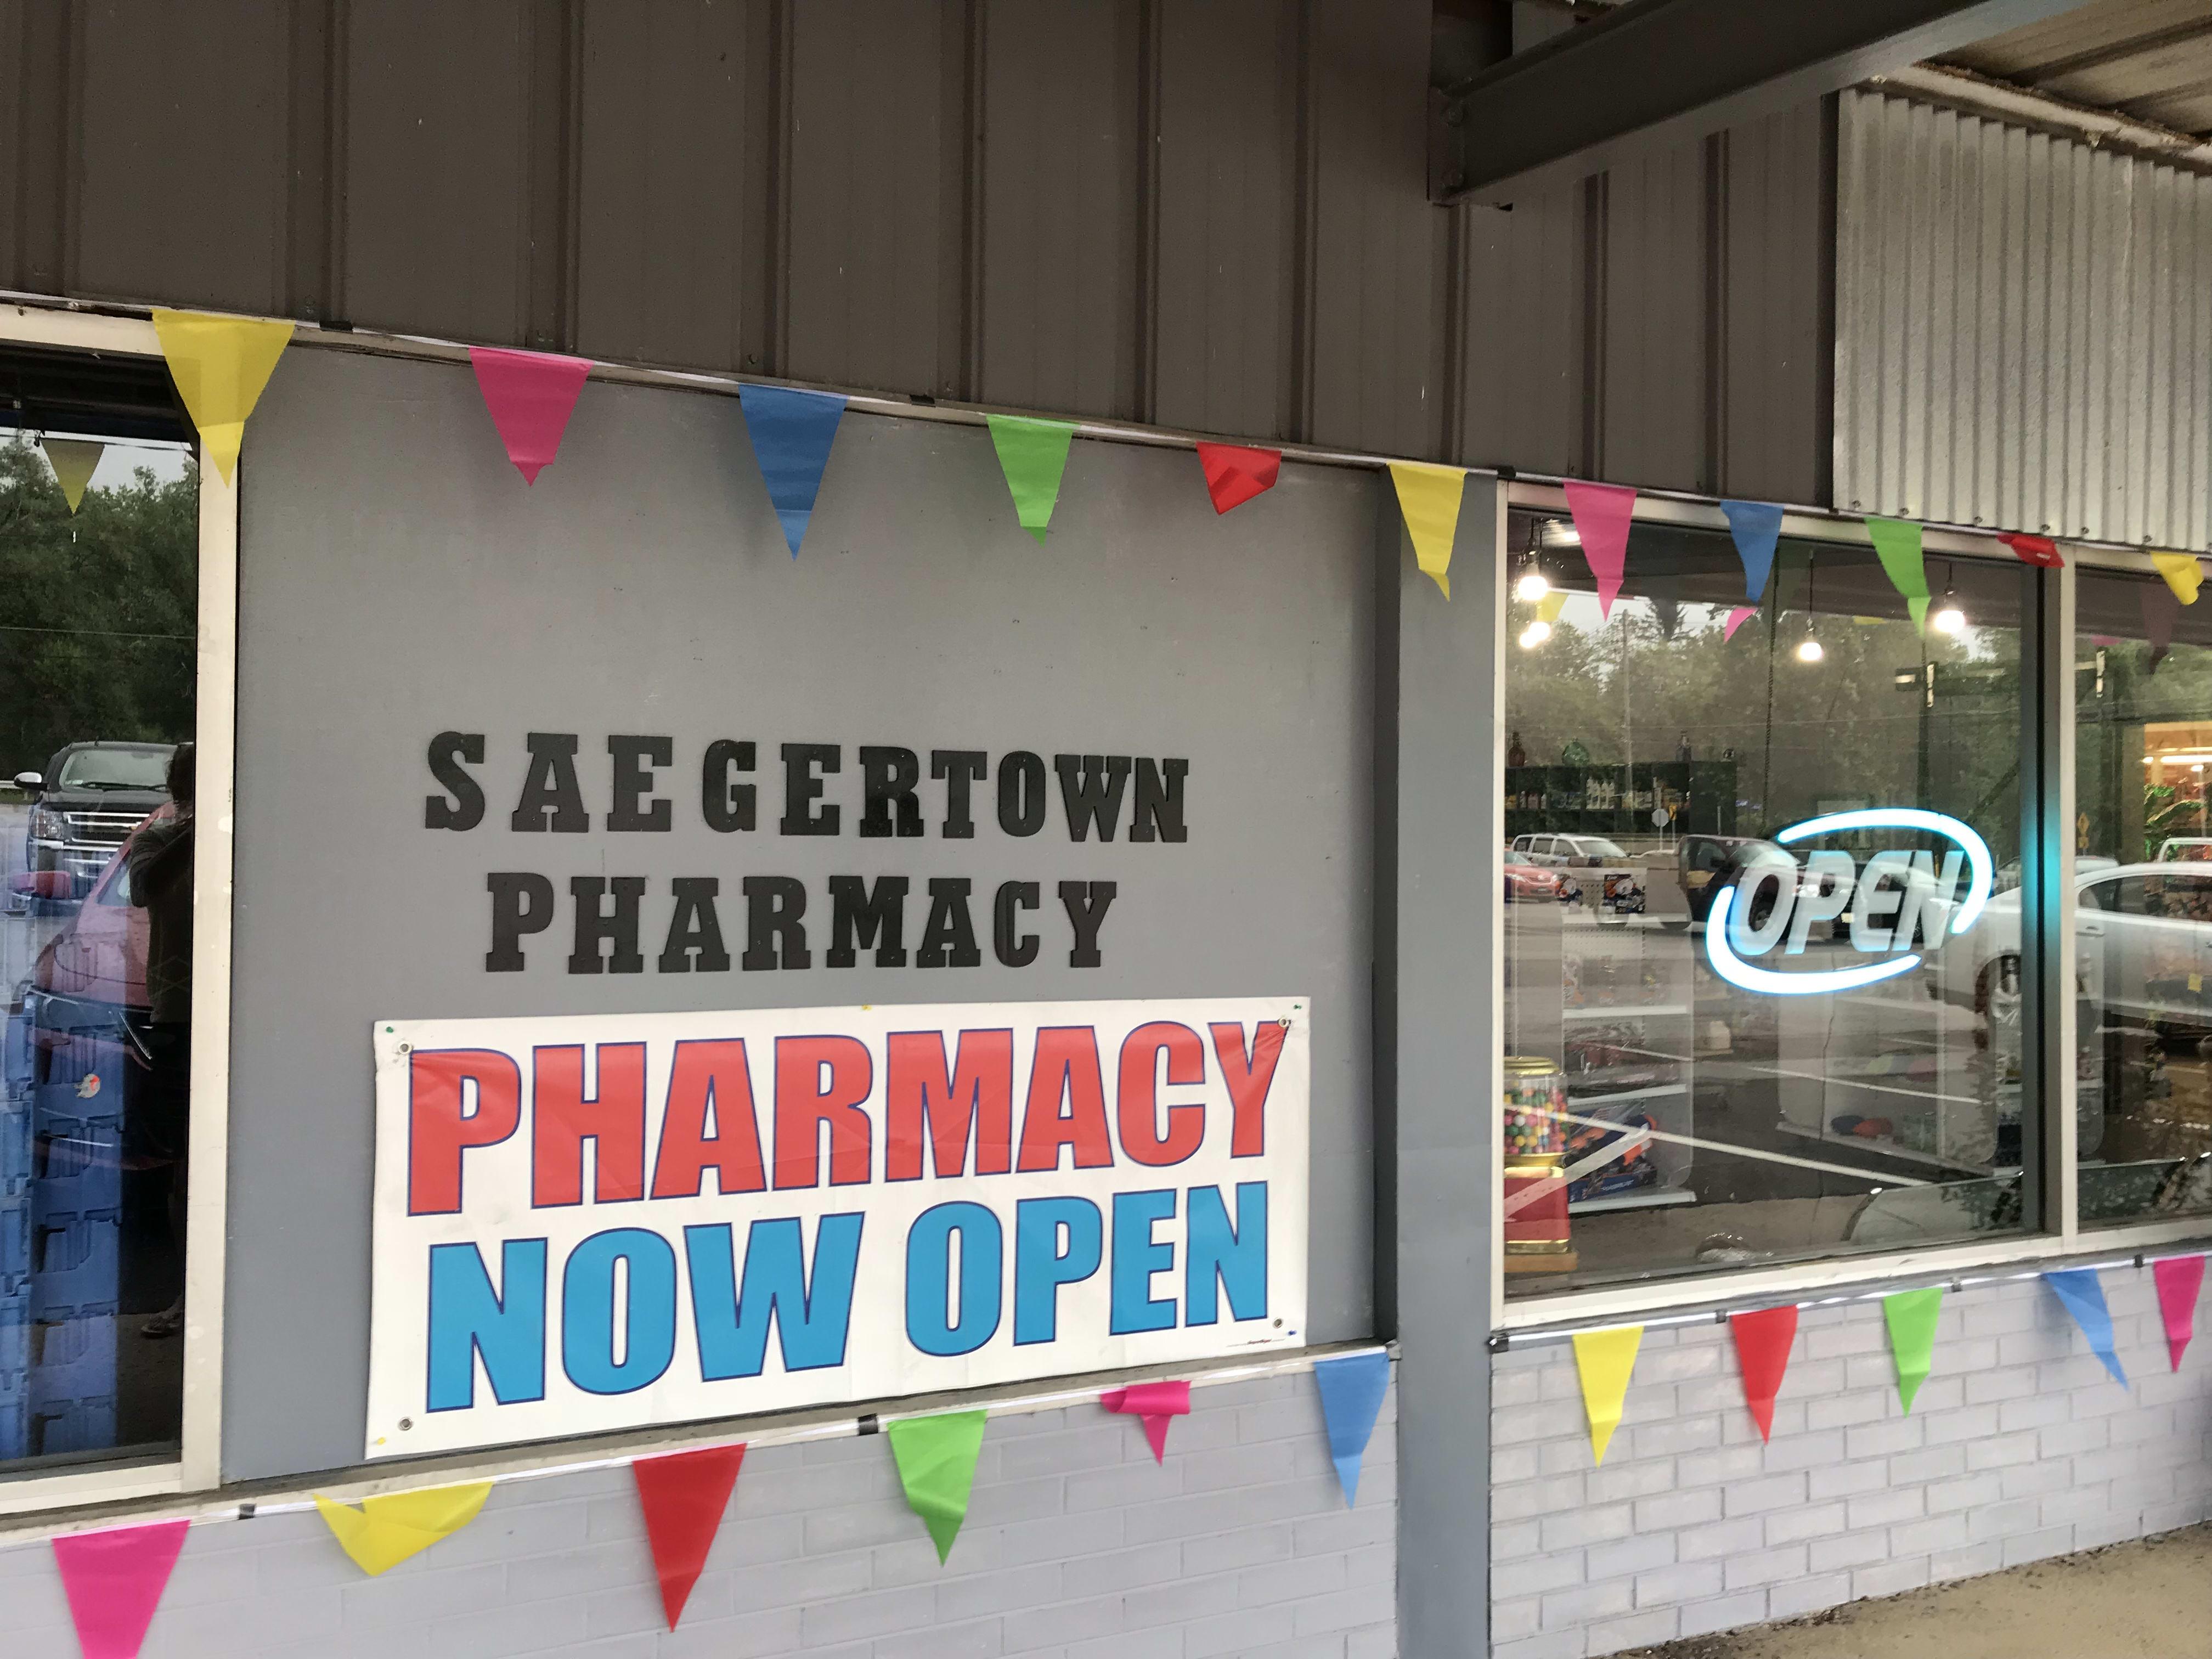 Saegertown Pharmacy